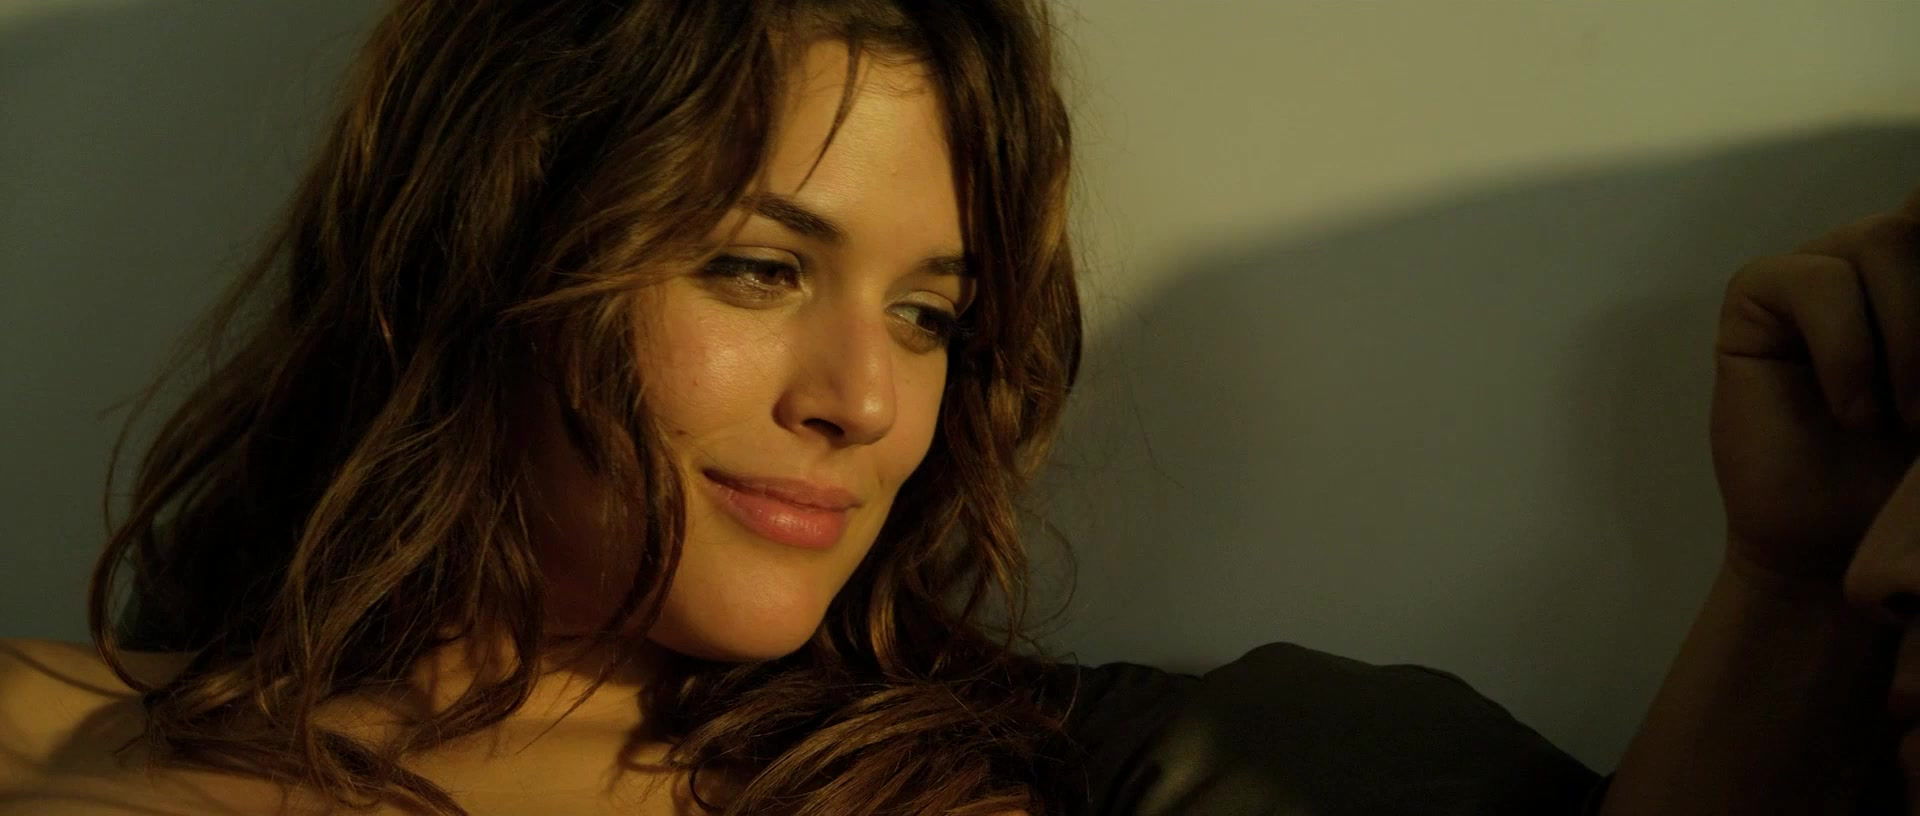 Adriana ugarte explicit sex in combustion movie